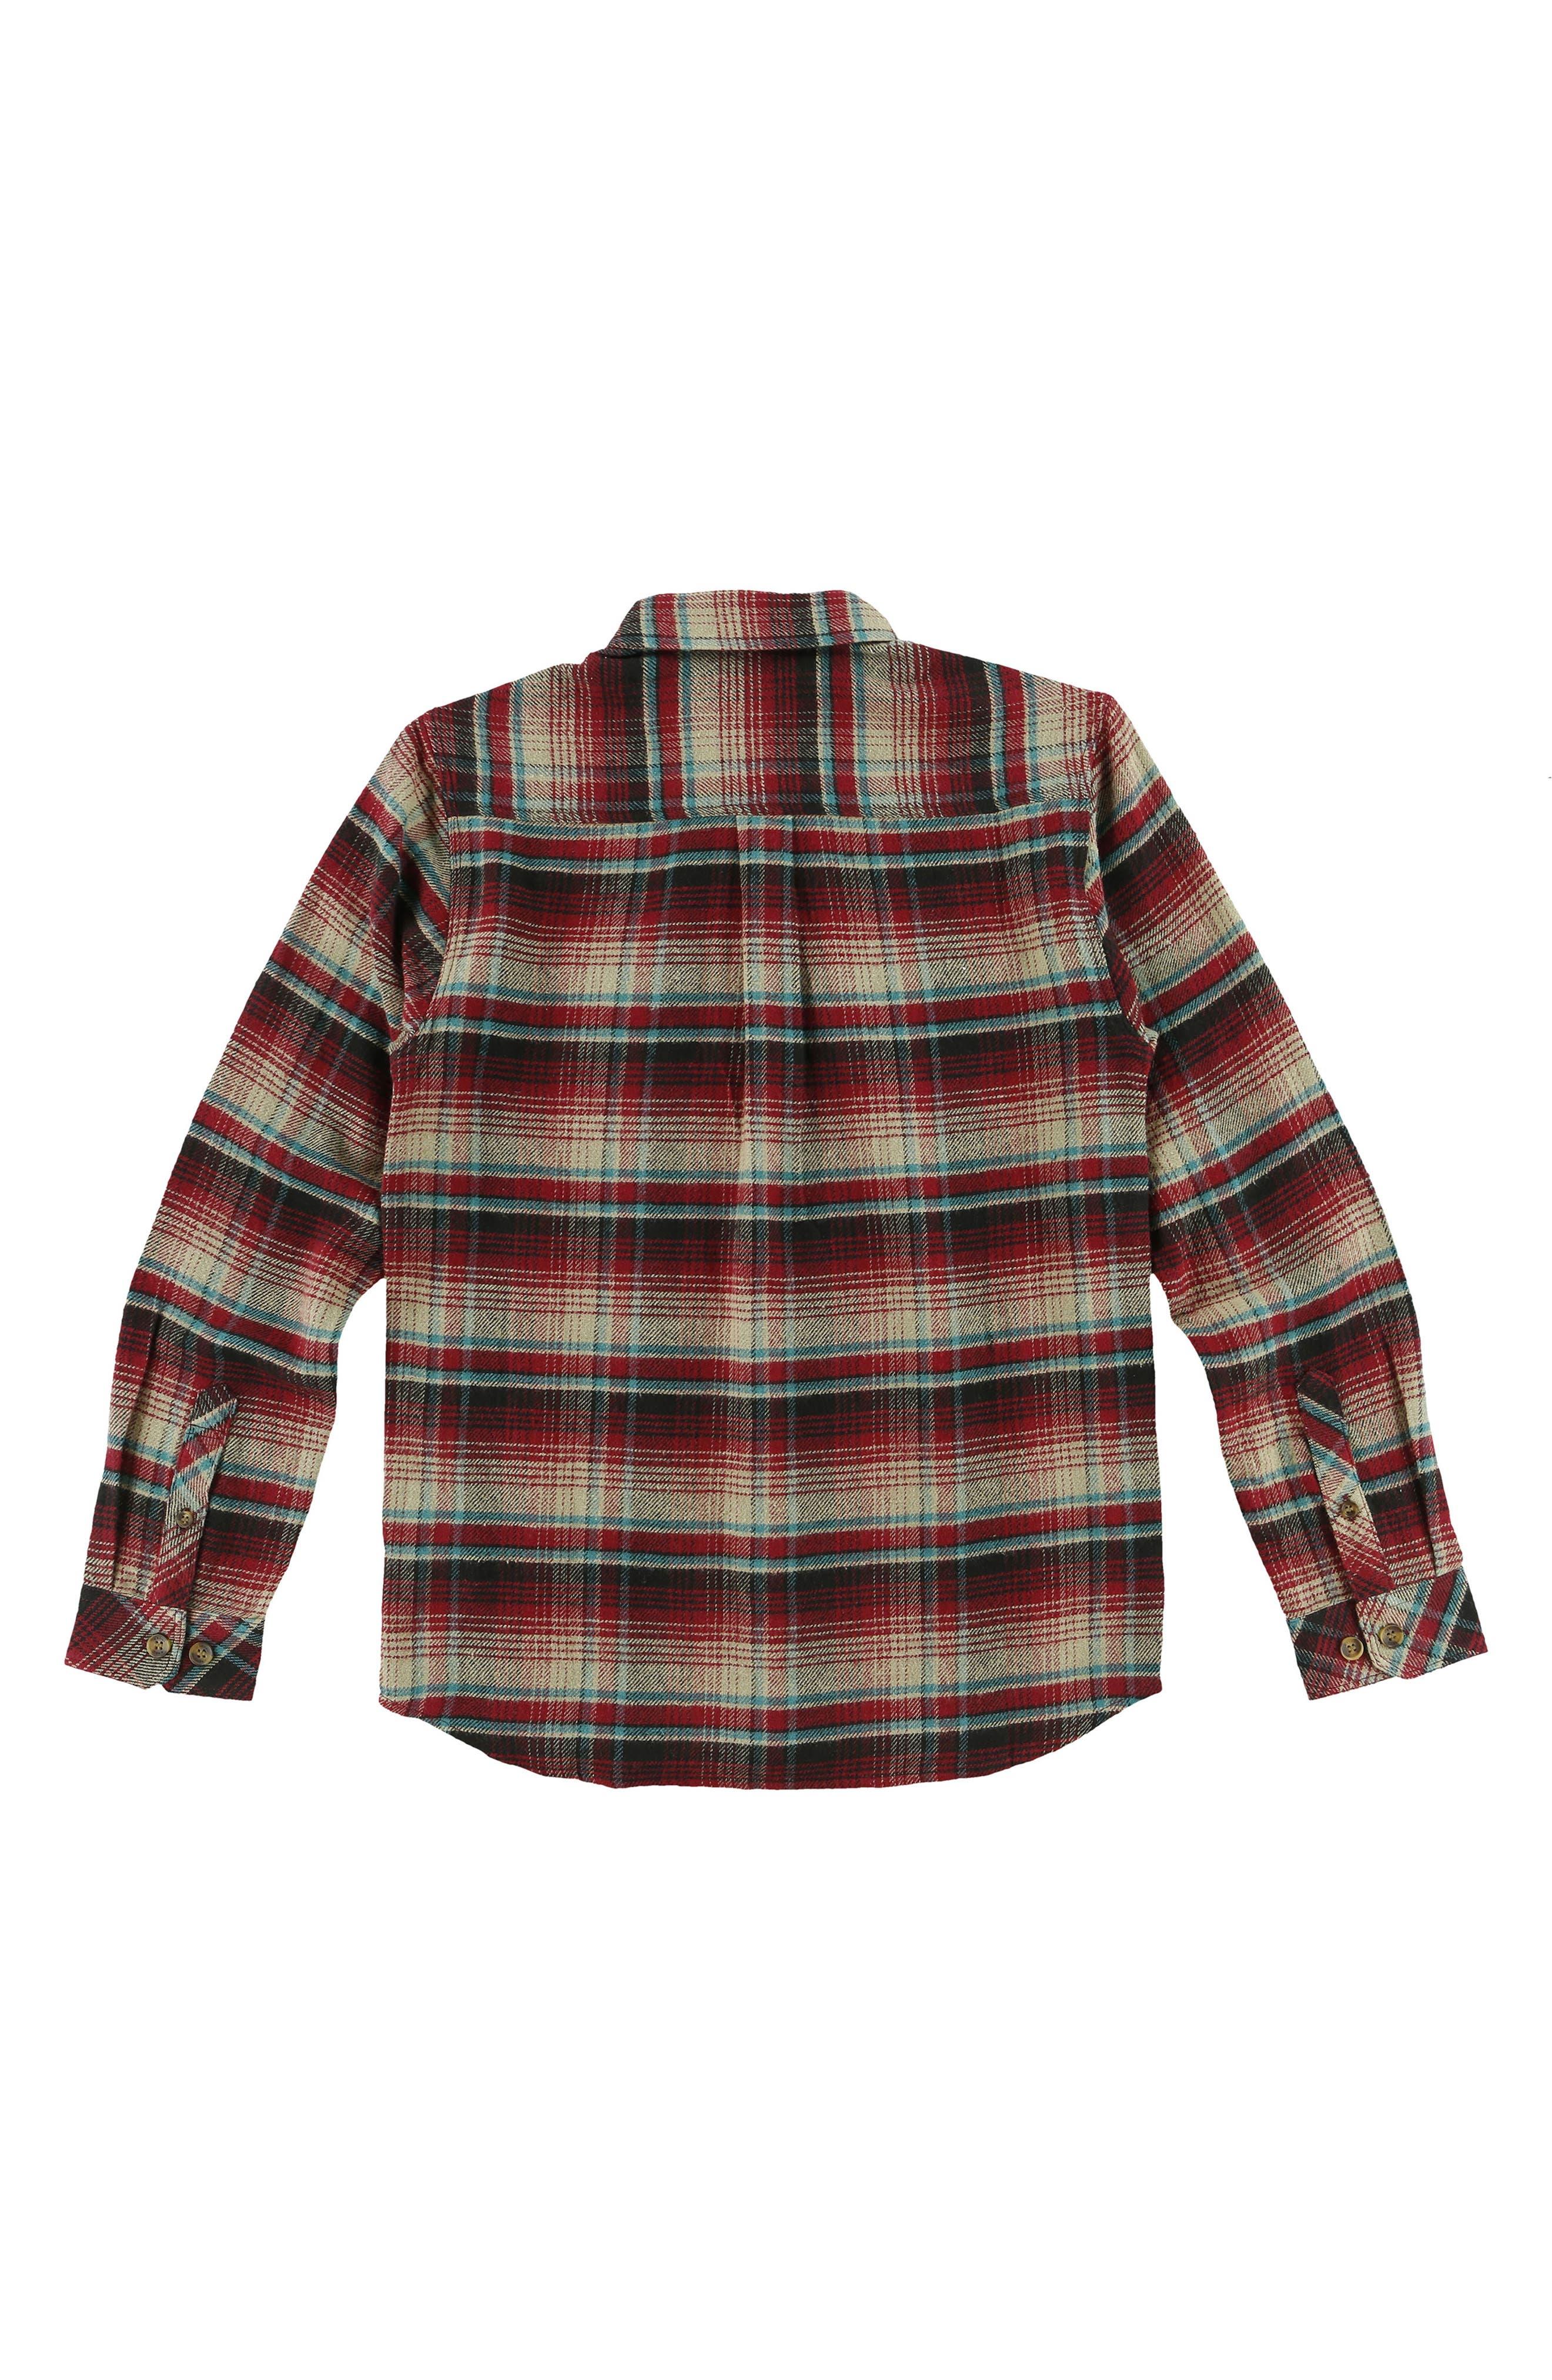 Alternate Image 2  - O'Neill Butler Plaid Flannel Shirt (Big Boys)